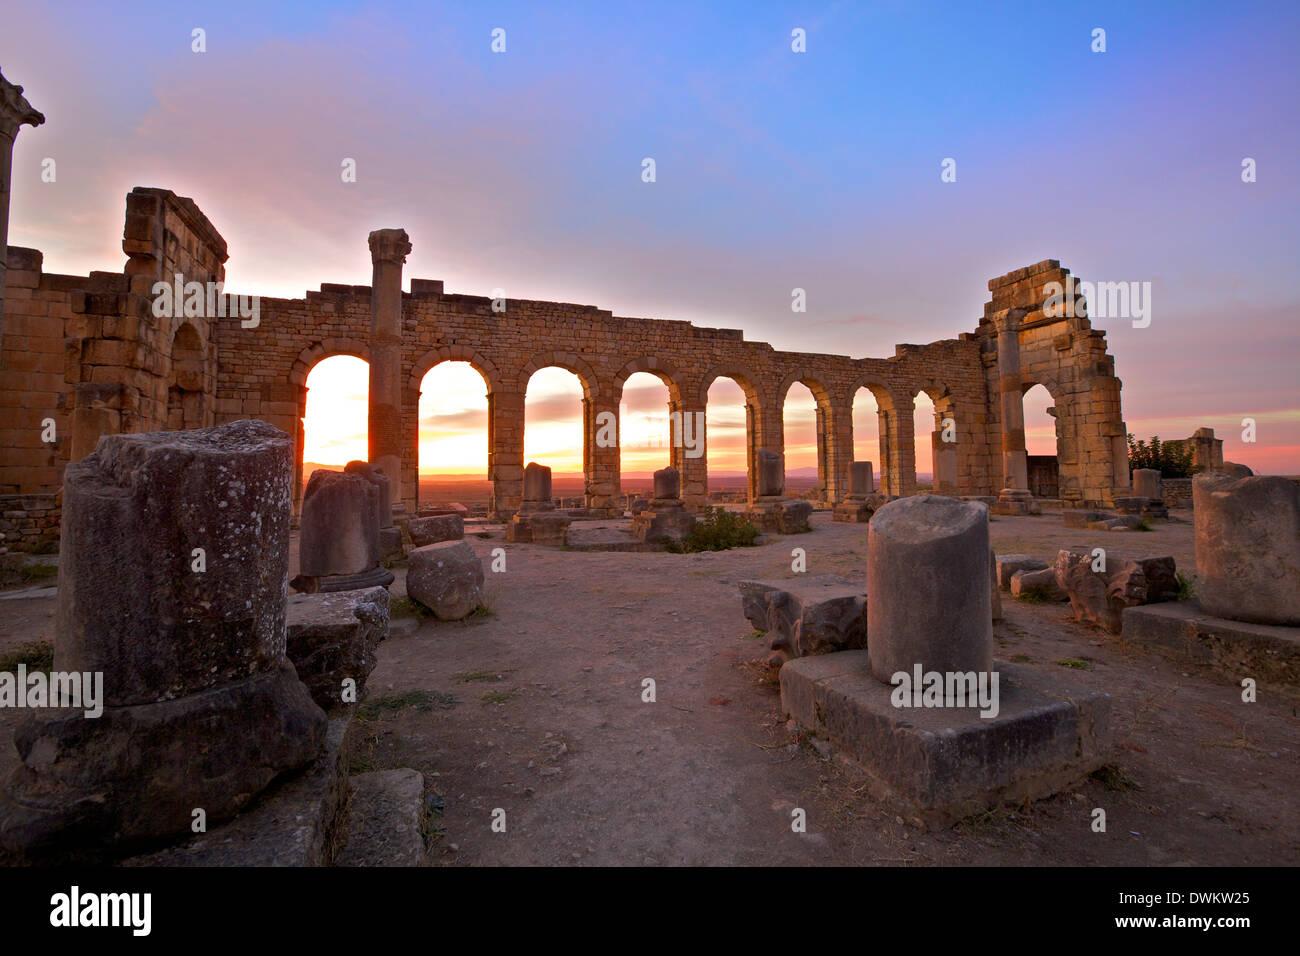 Excavated Roman City, Volubilis, UNESCO World Heritage Site, Morocco, North Africa, Africa - Stock Image